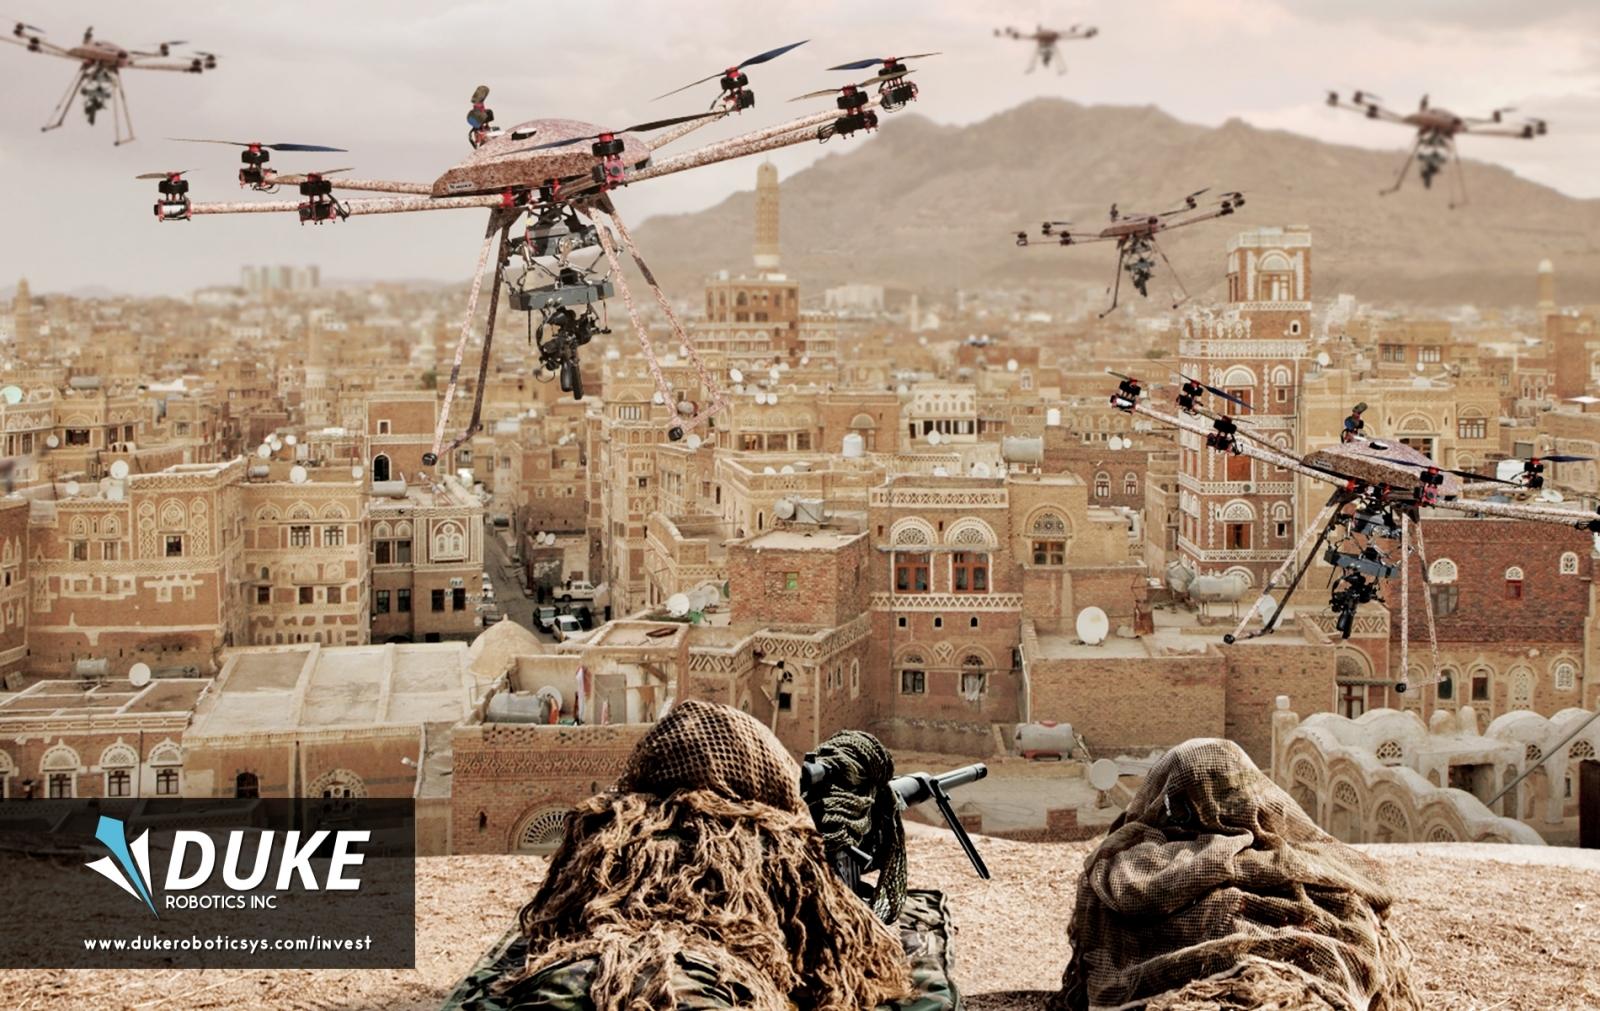 Drones in battle